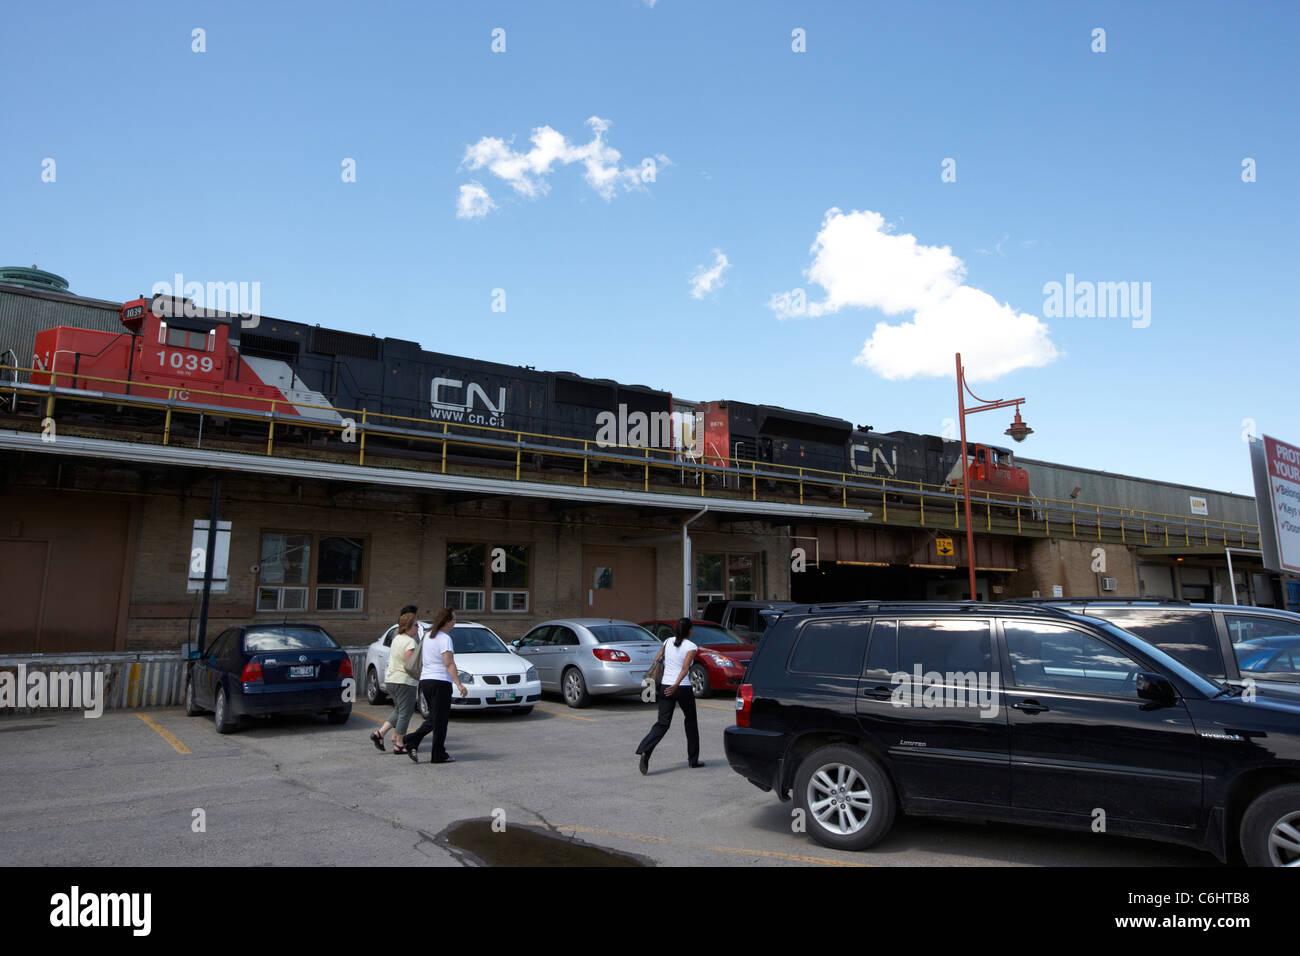 car park and locomotives at rear of union station winnipeg manitoba canada - Stock Image